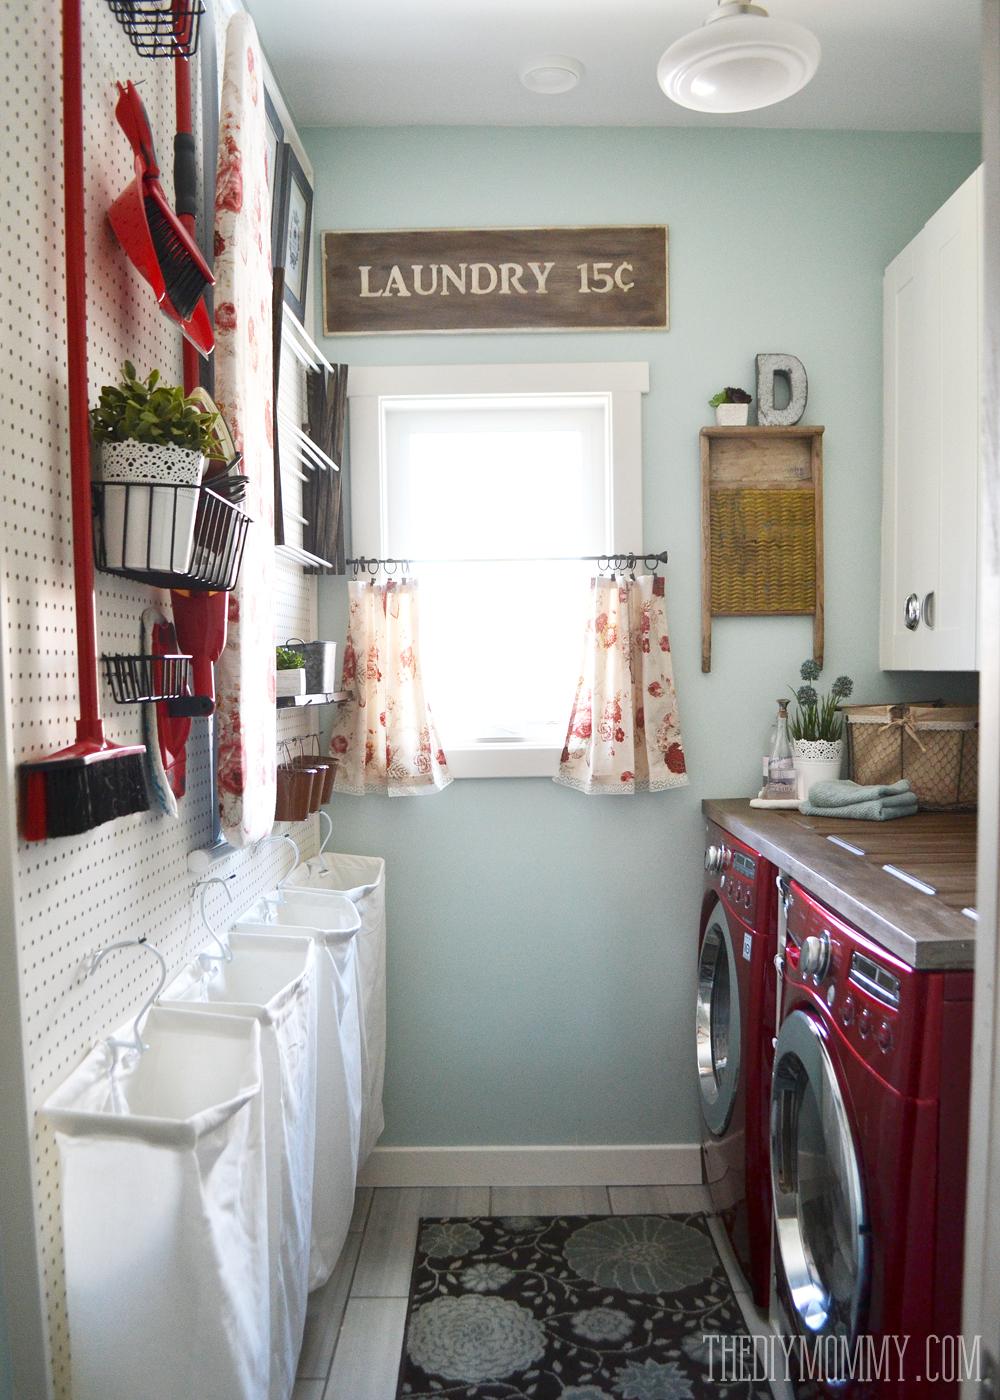 Laundry Room Designer: Our DIY House: 2015 Home Tour